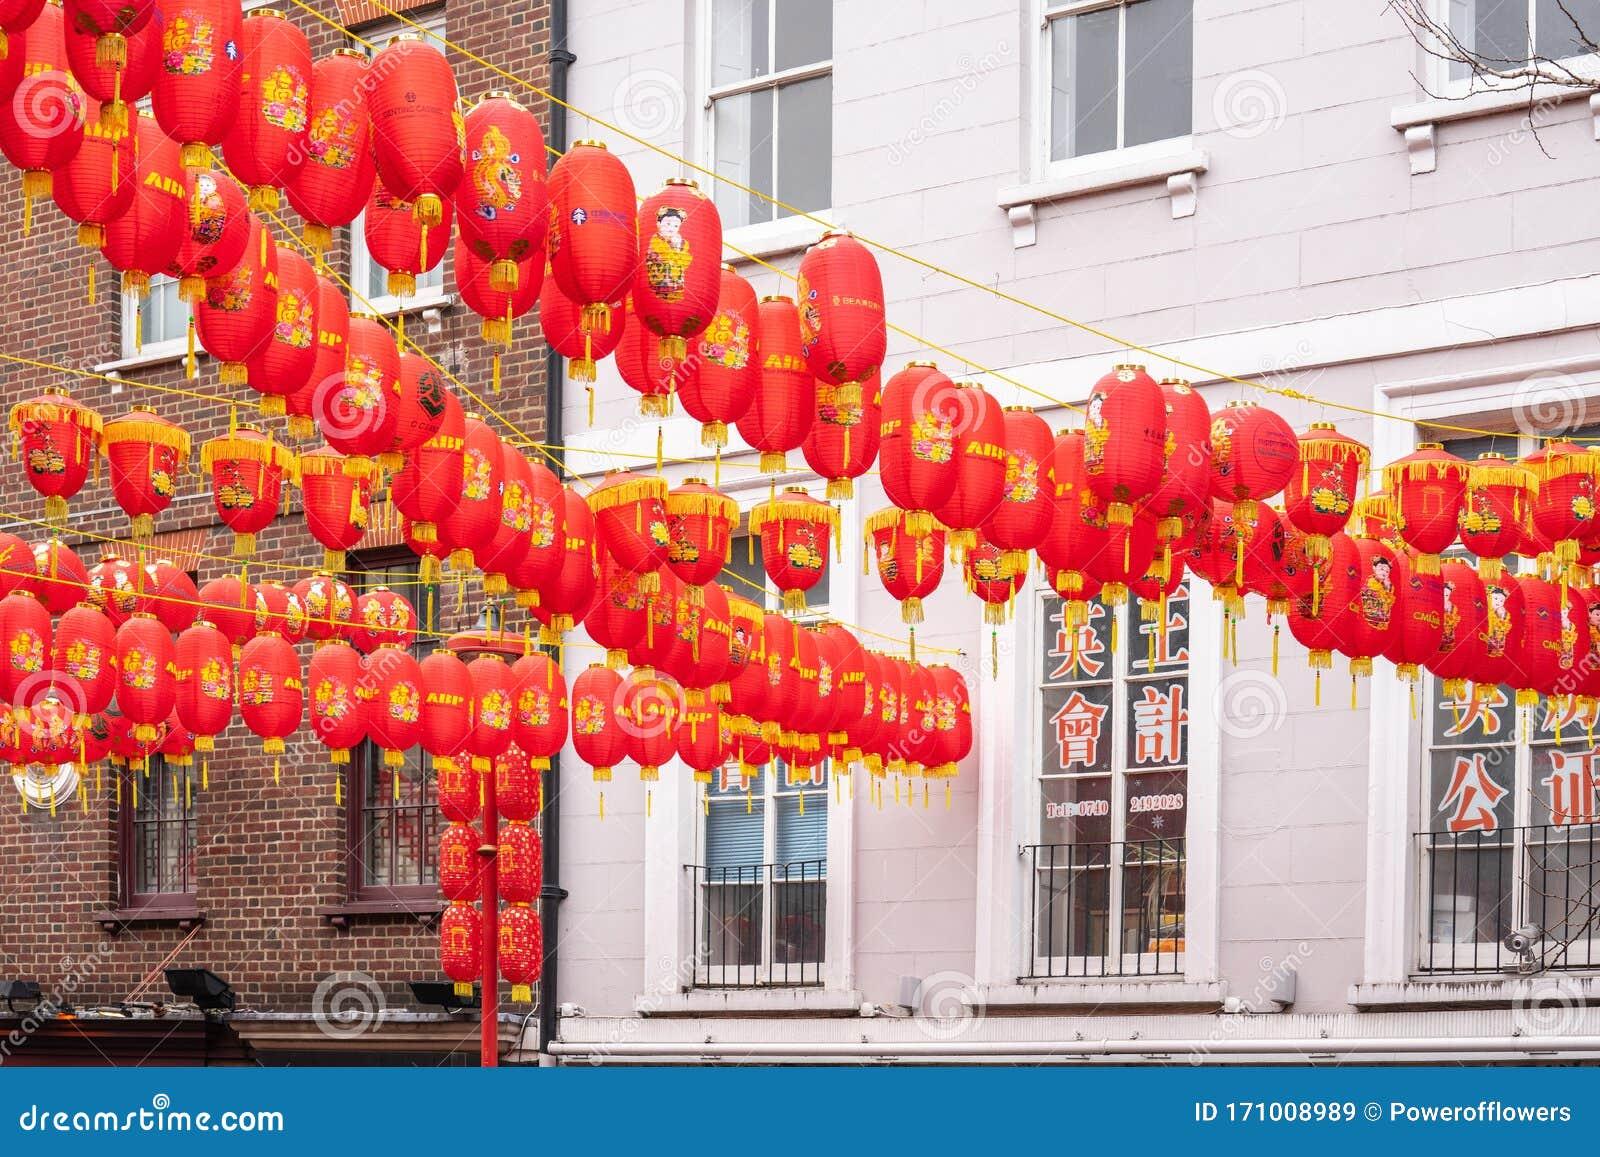 London January 26 2020 Chinese Paper Lanterns London Chinatown Chinese New Year Celebrations Editorial Stock Image Image Of Colorful China 171008989